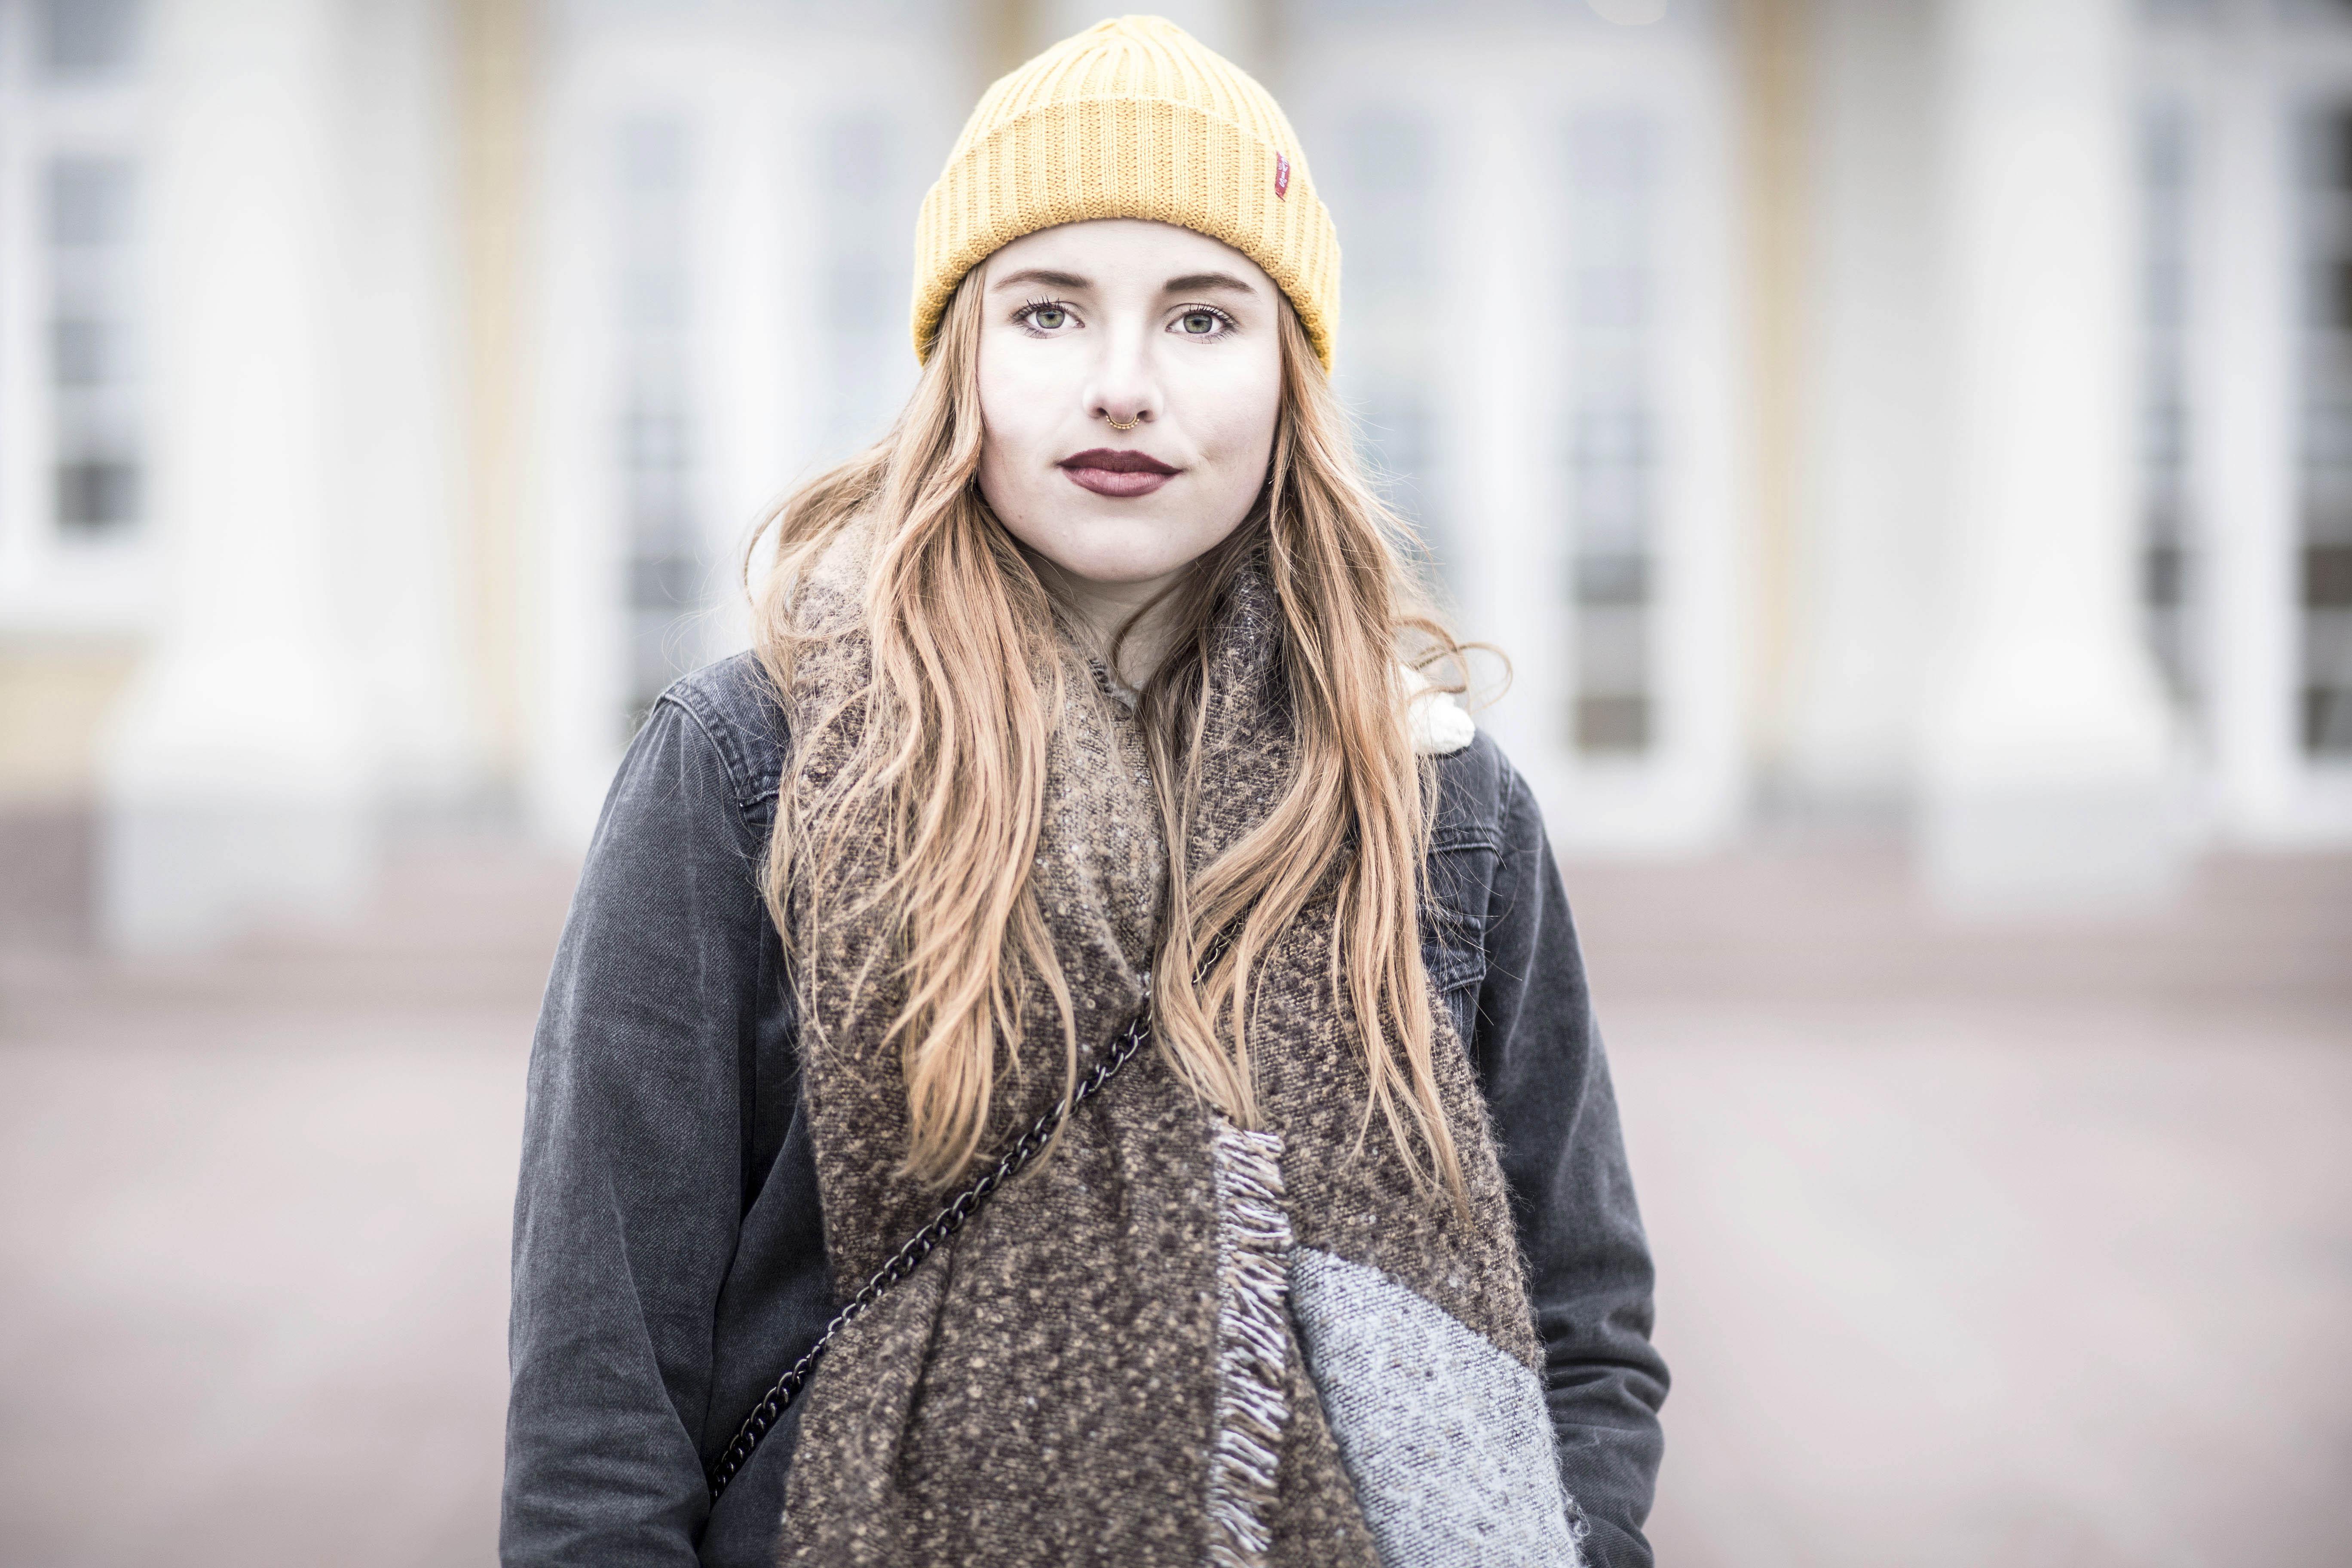 sassy-classy-scarf_25